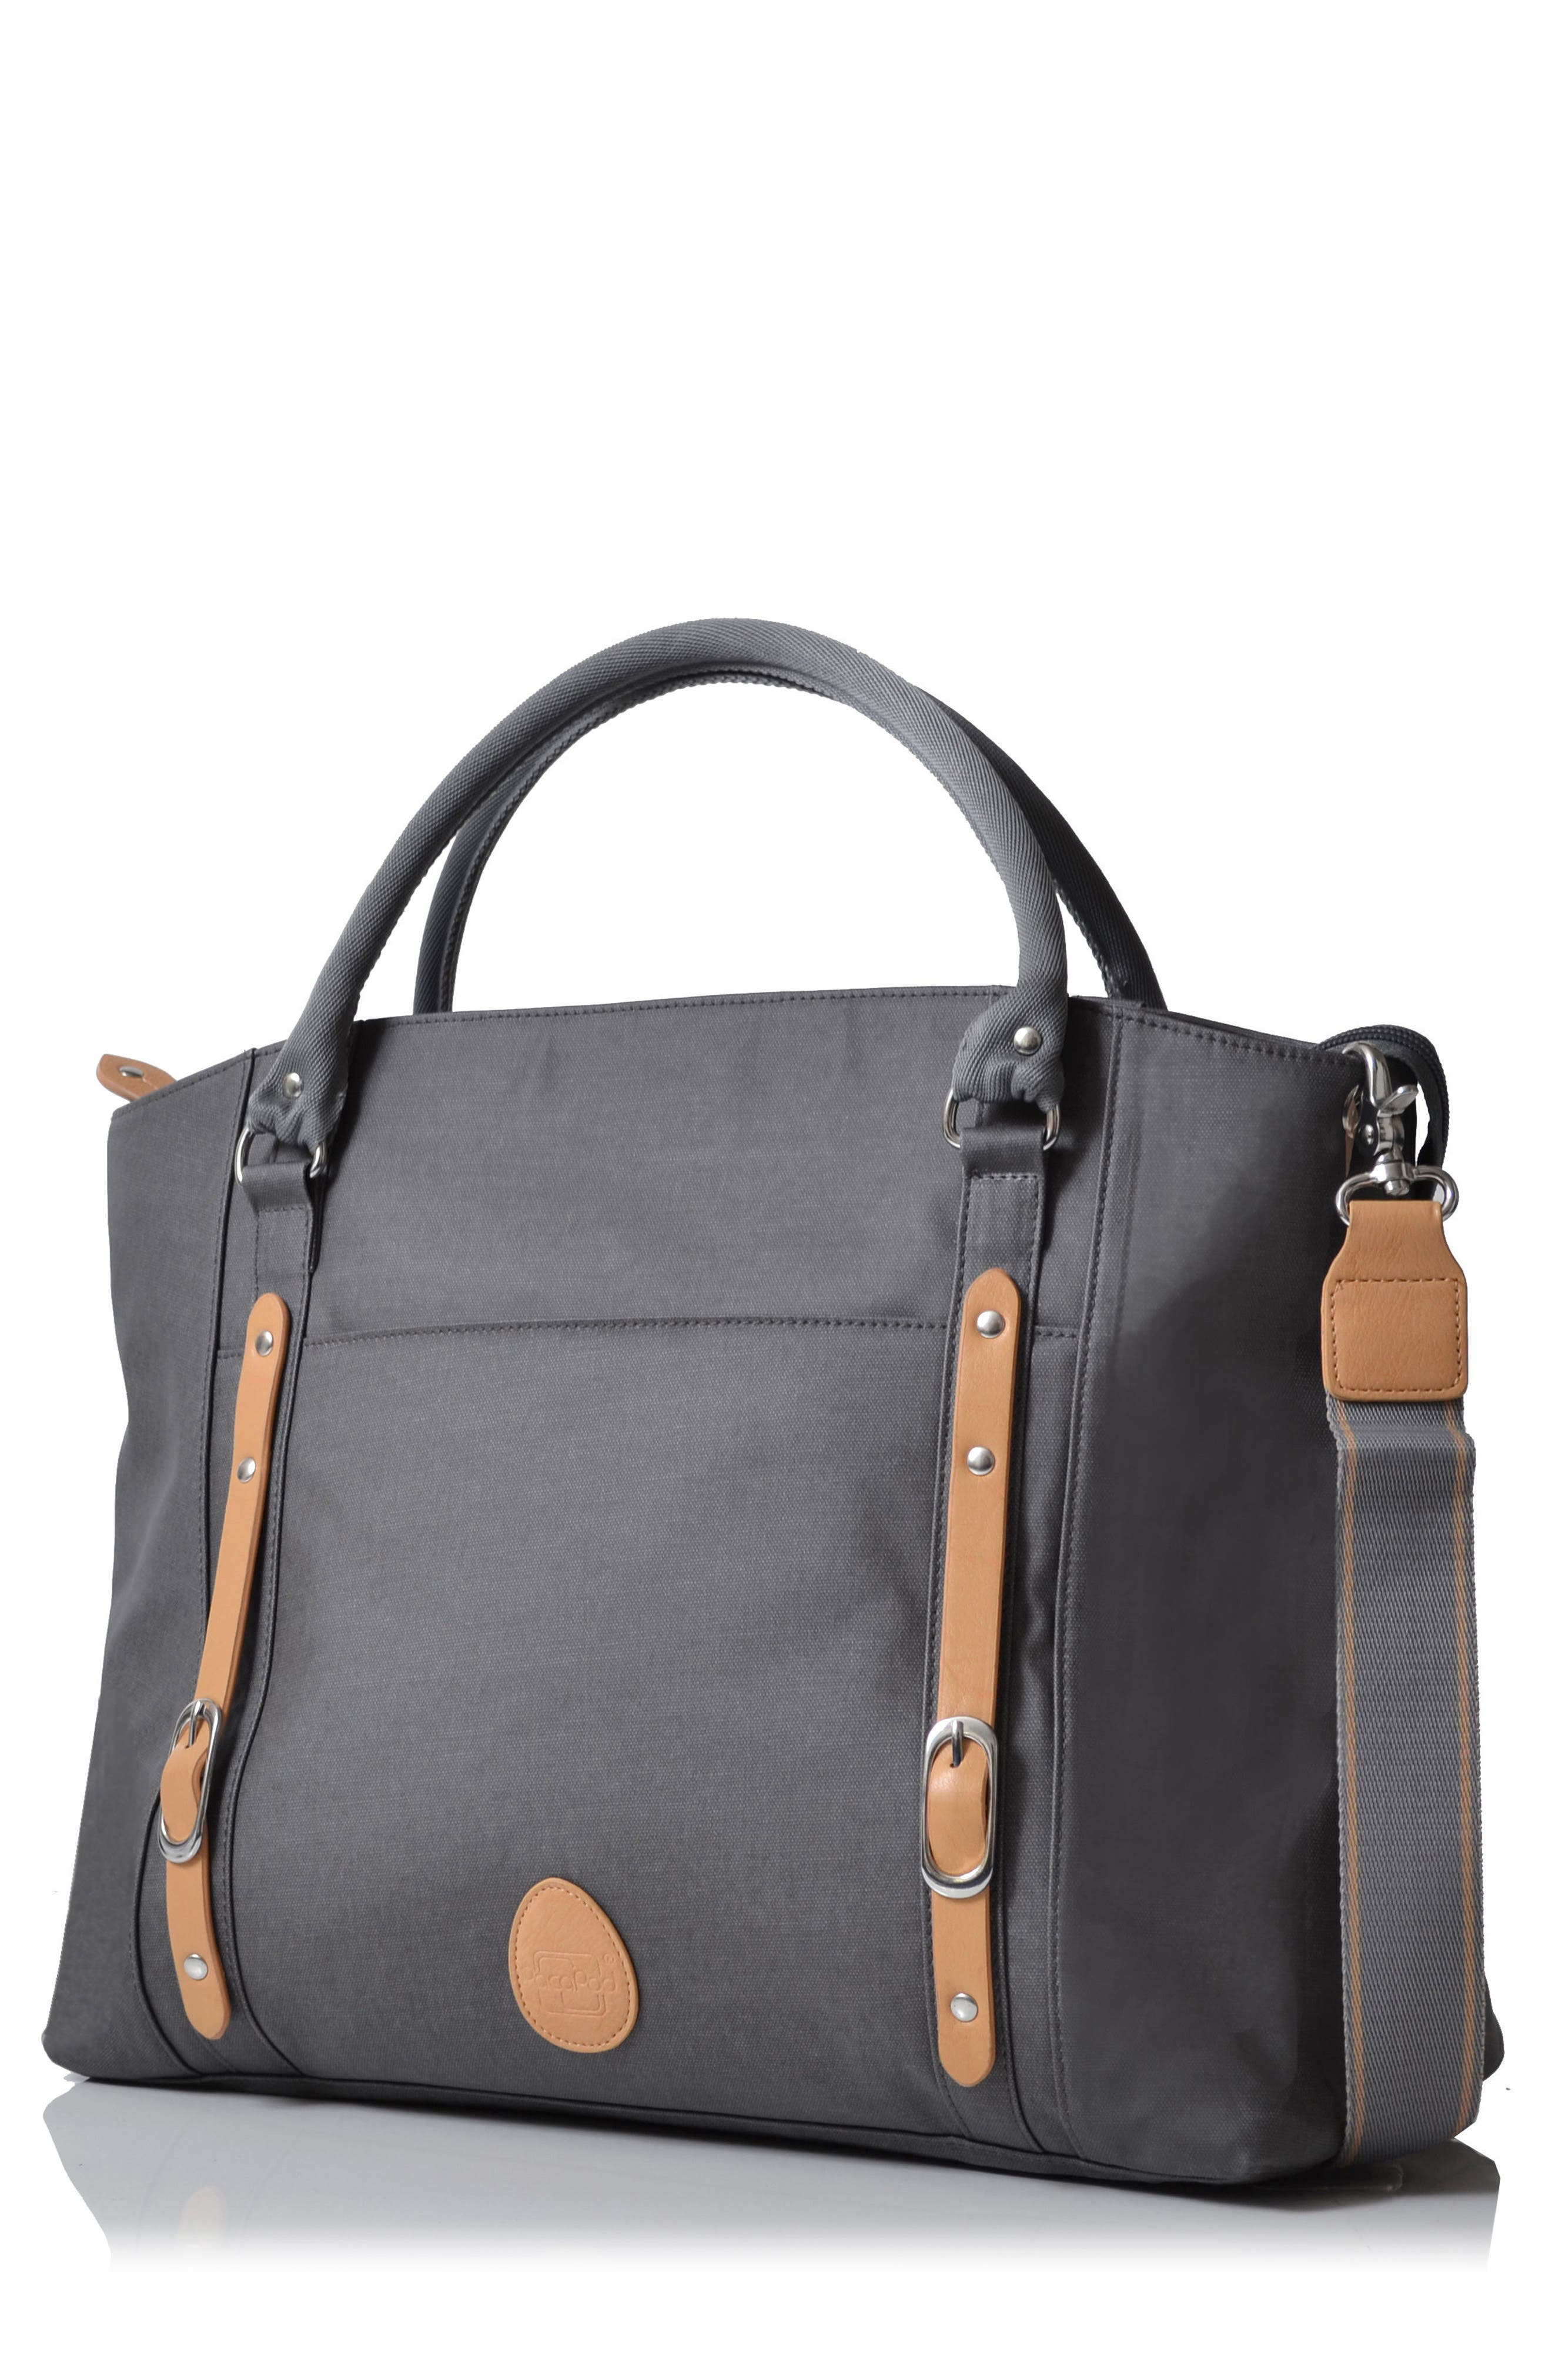 Main Image - PacaPod 'Mirano' Diaper Bag